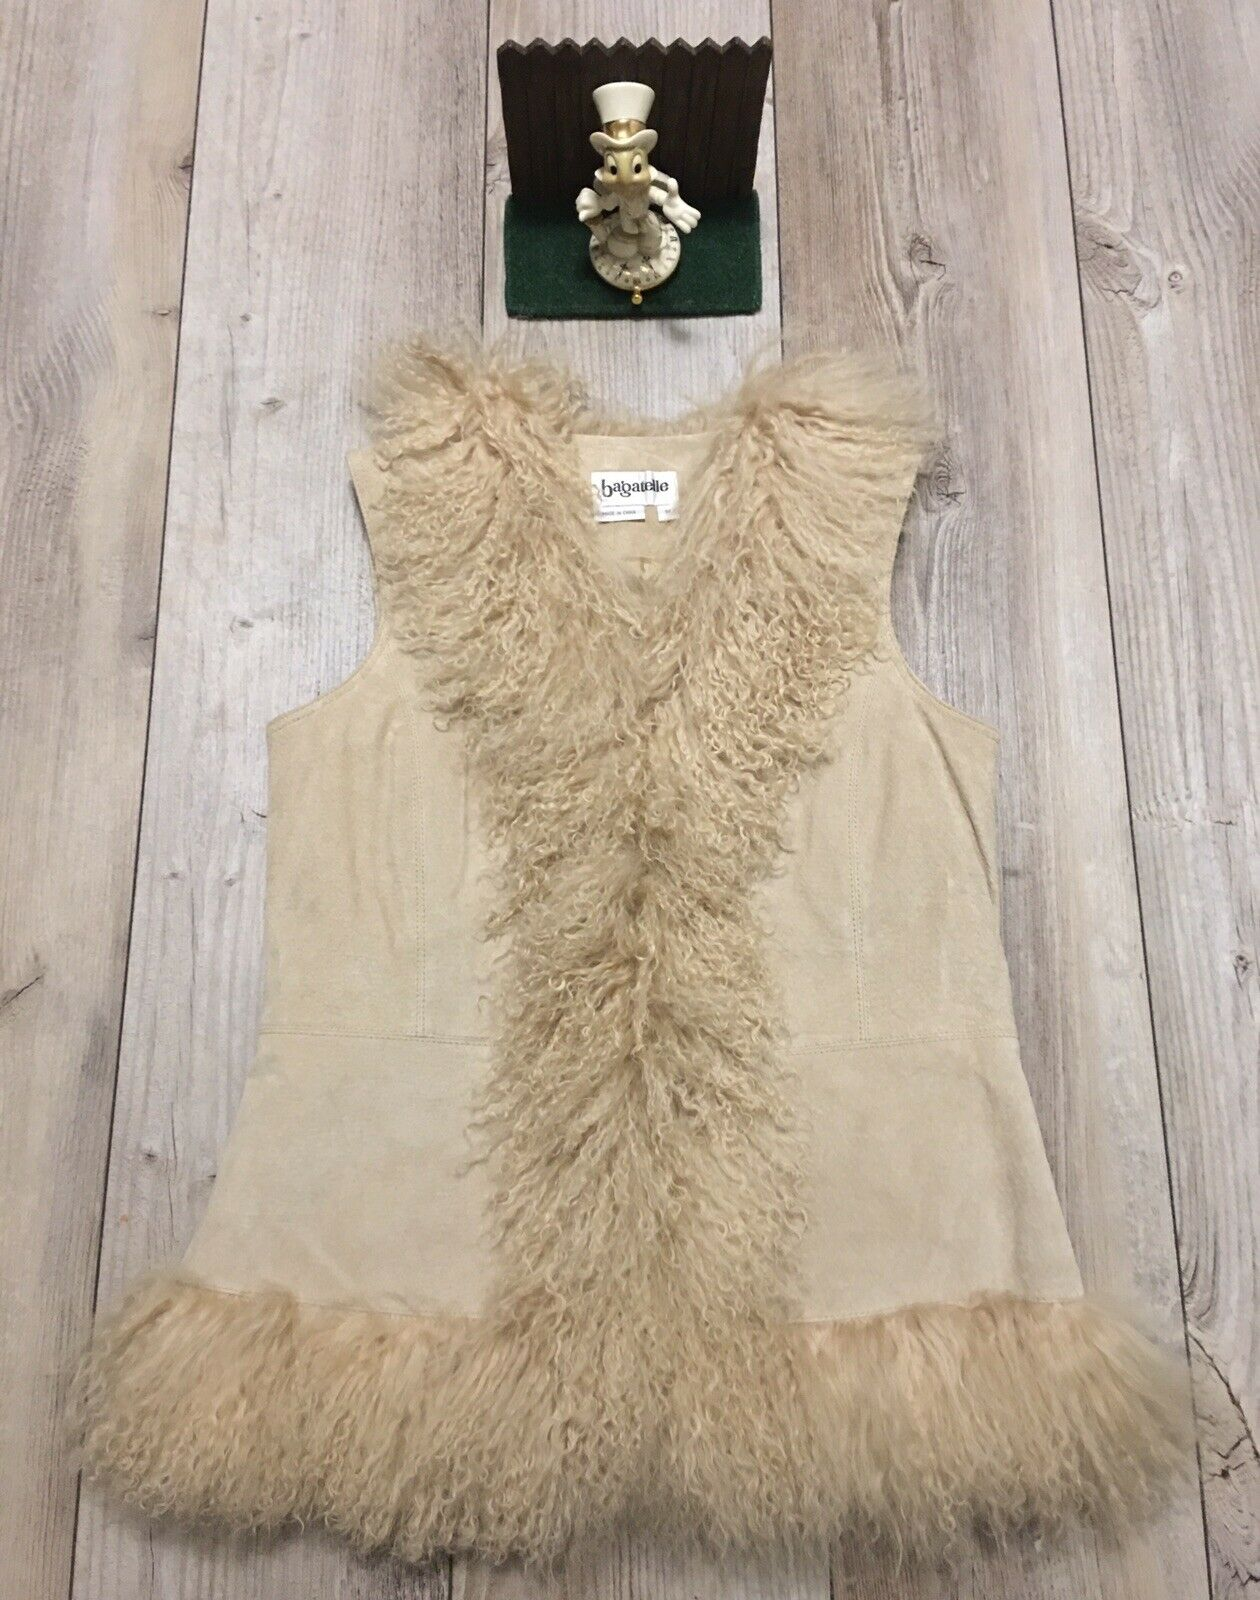 Bagatelle Beige Leather Mongolian Lamb Fur Hook and Loop Vest L1306 New Display